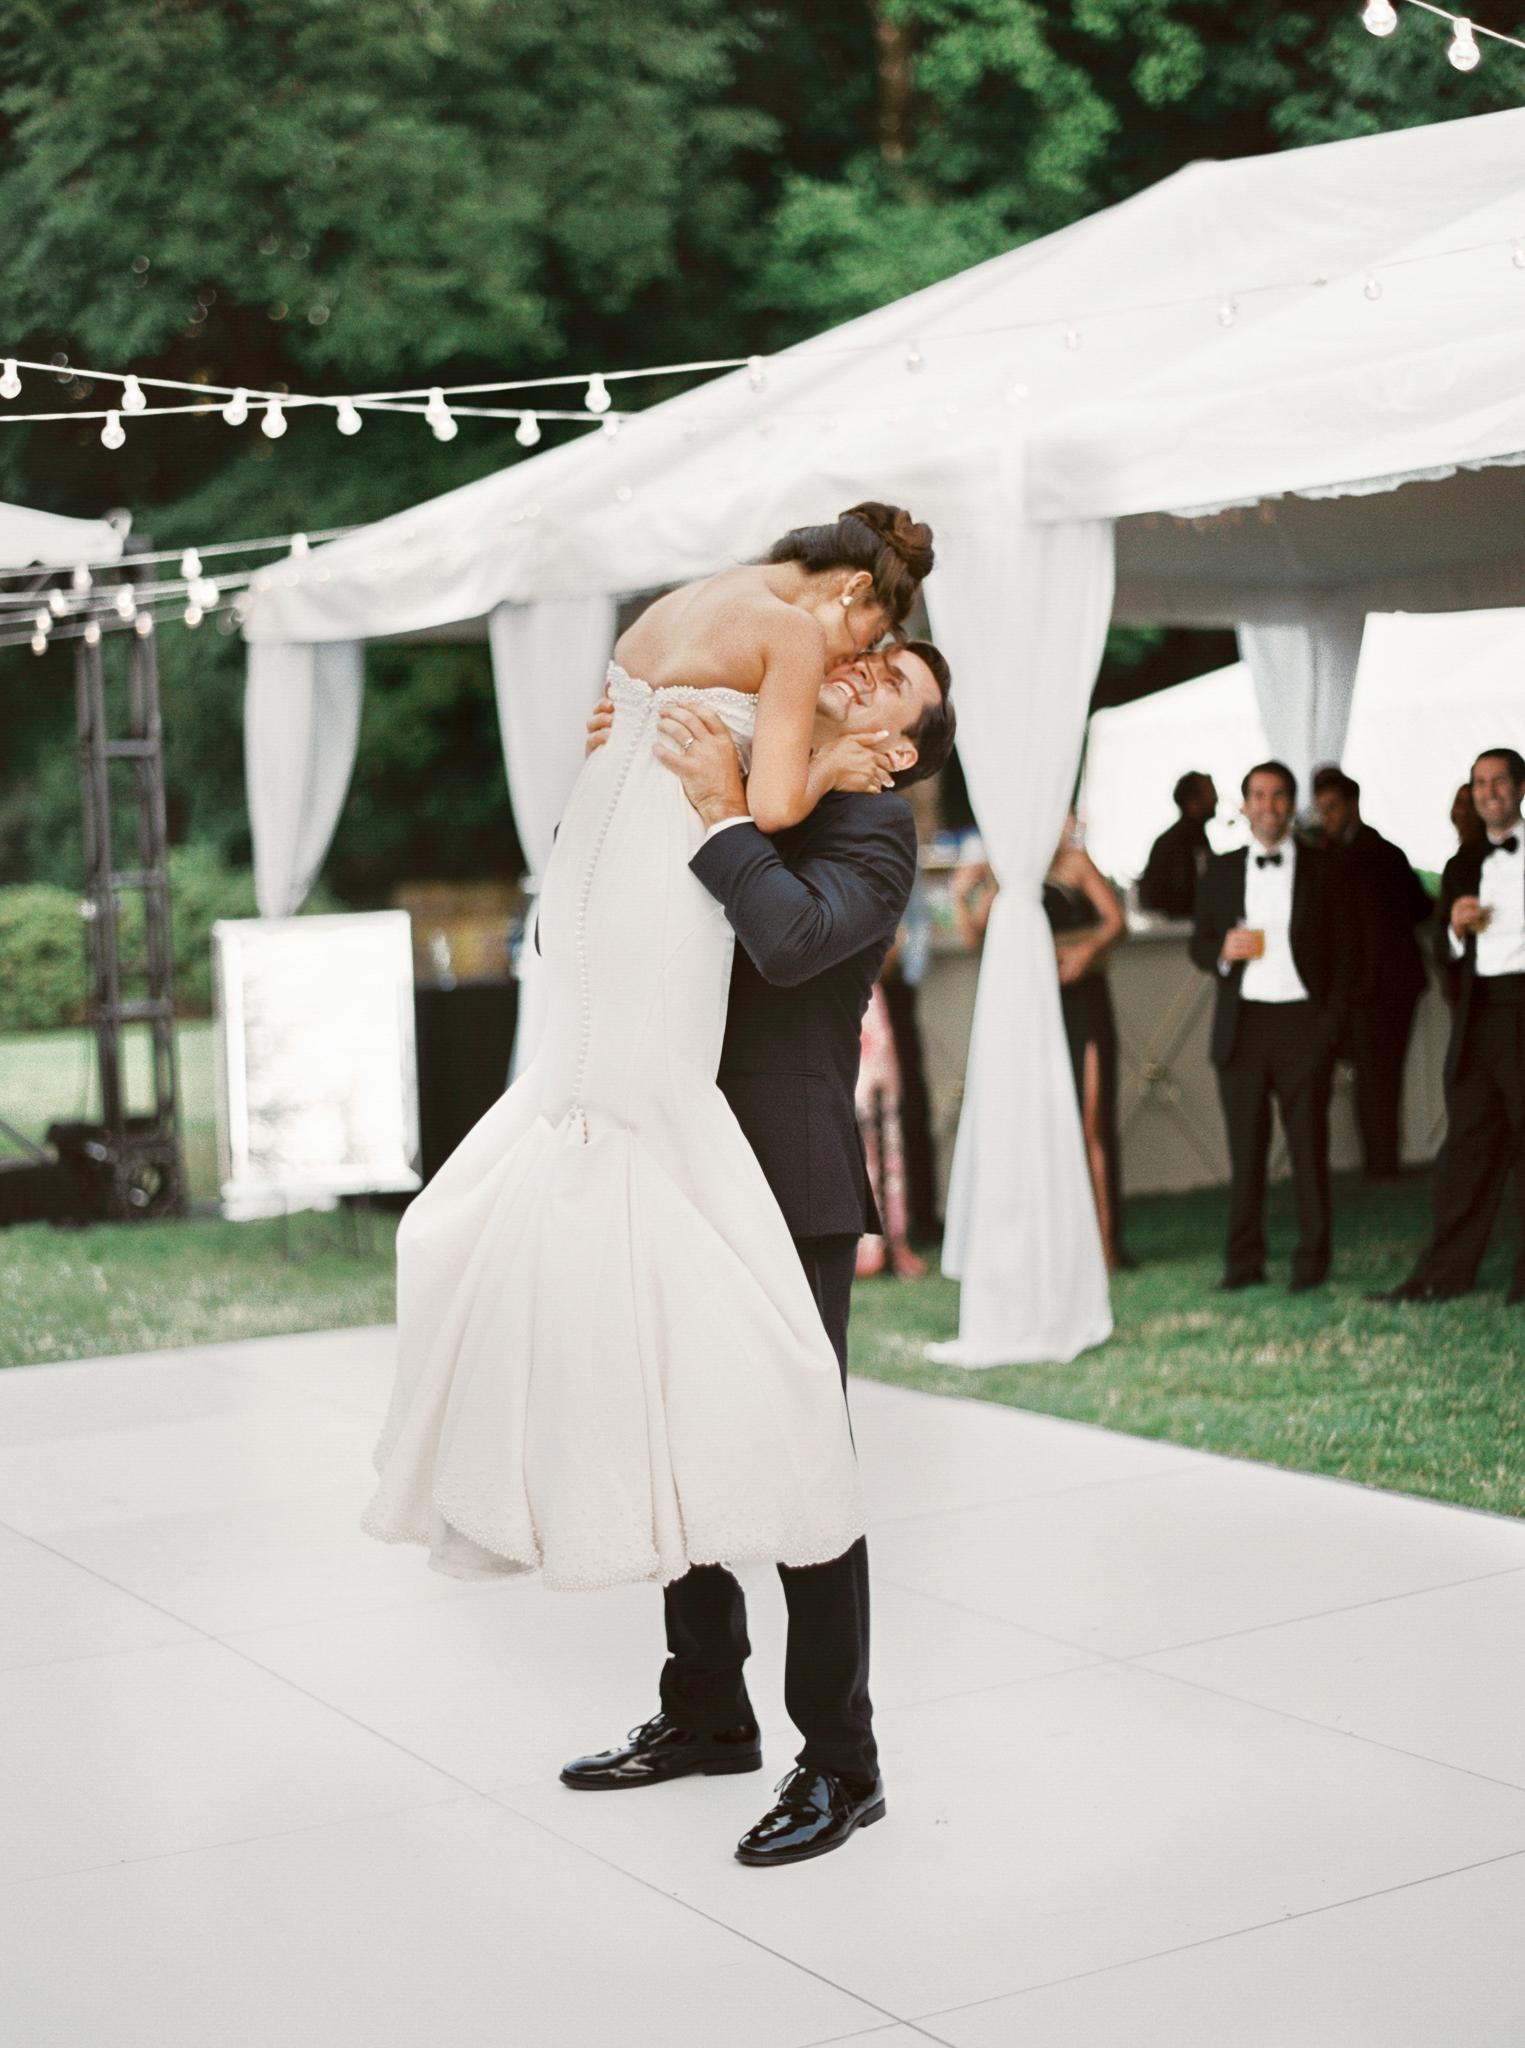 185OutliveCreative_Travel_Photographer_Videographer_Lewis&Clark_Oregon_Elegant_BlackTie_Destination_Wedding.jpg